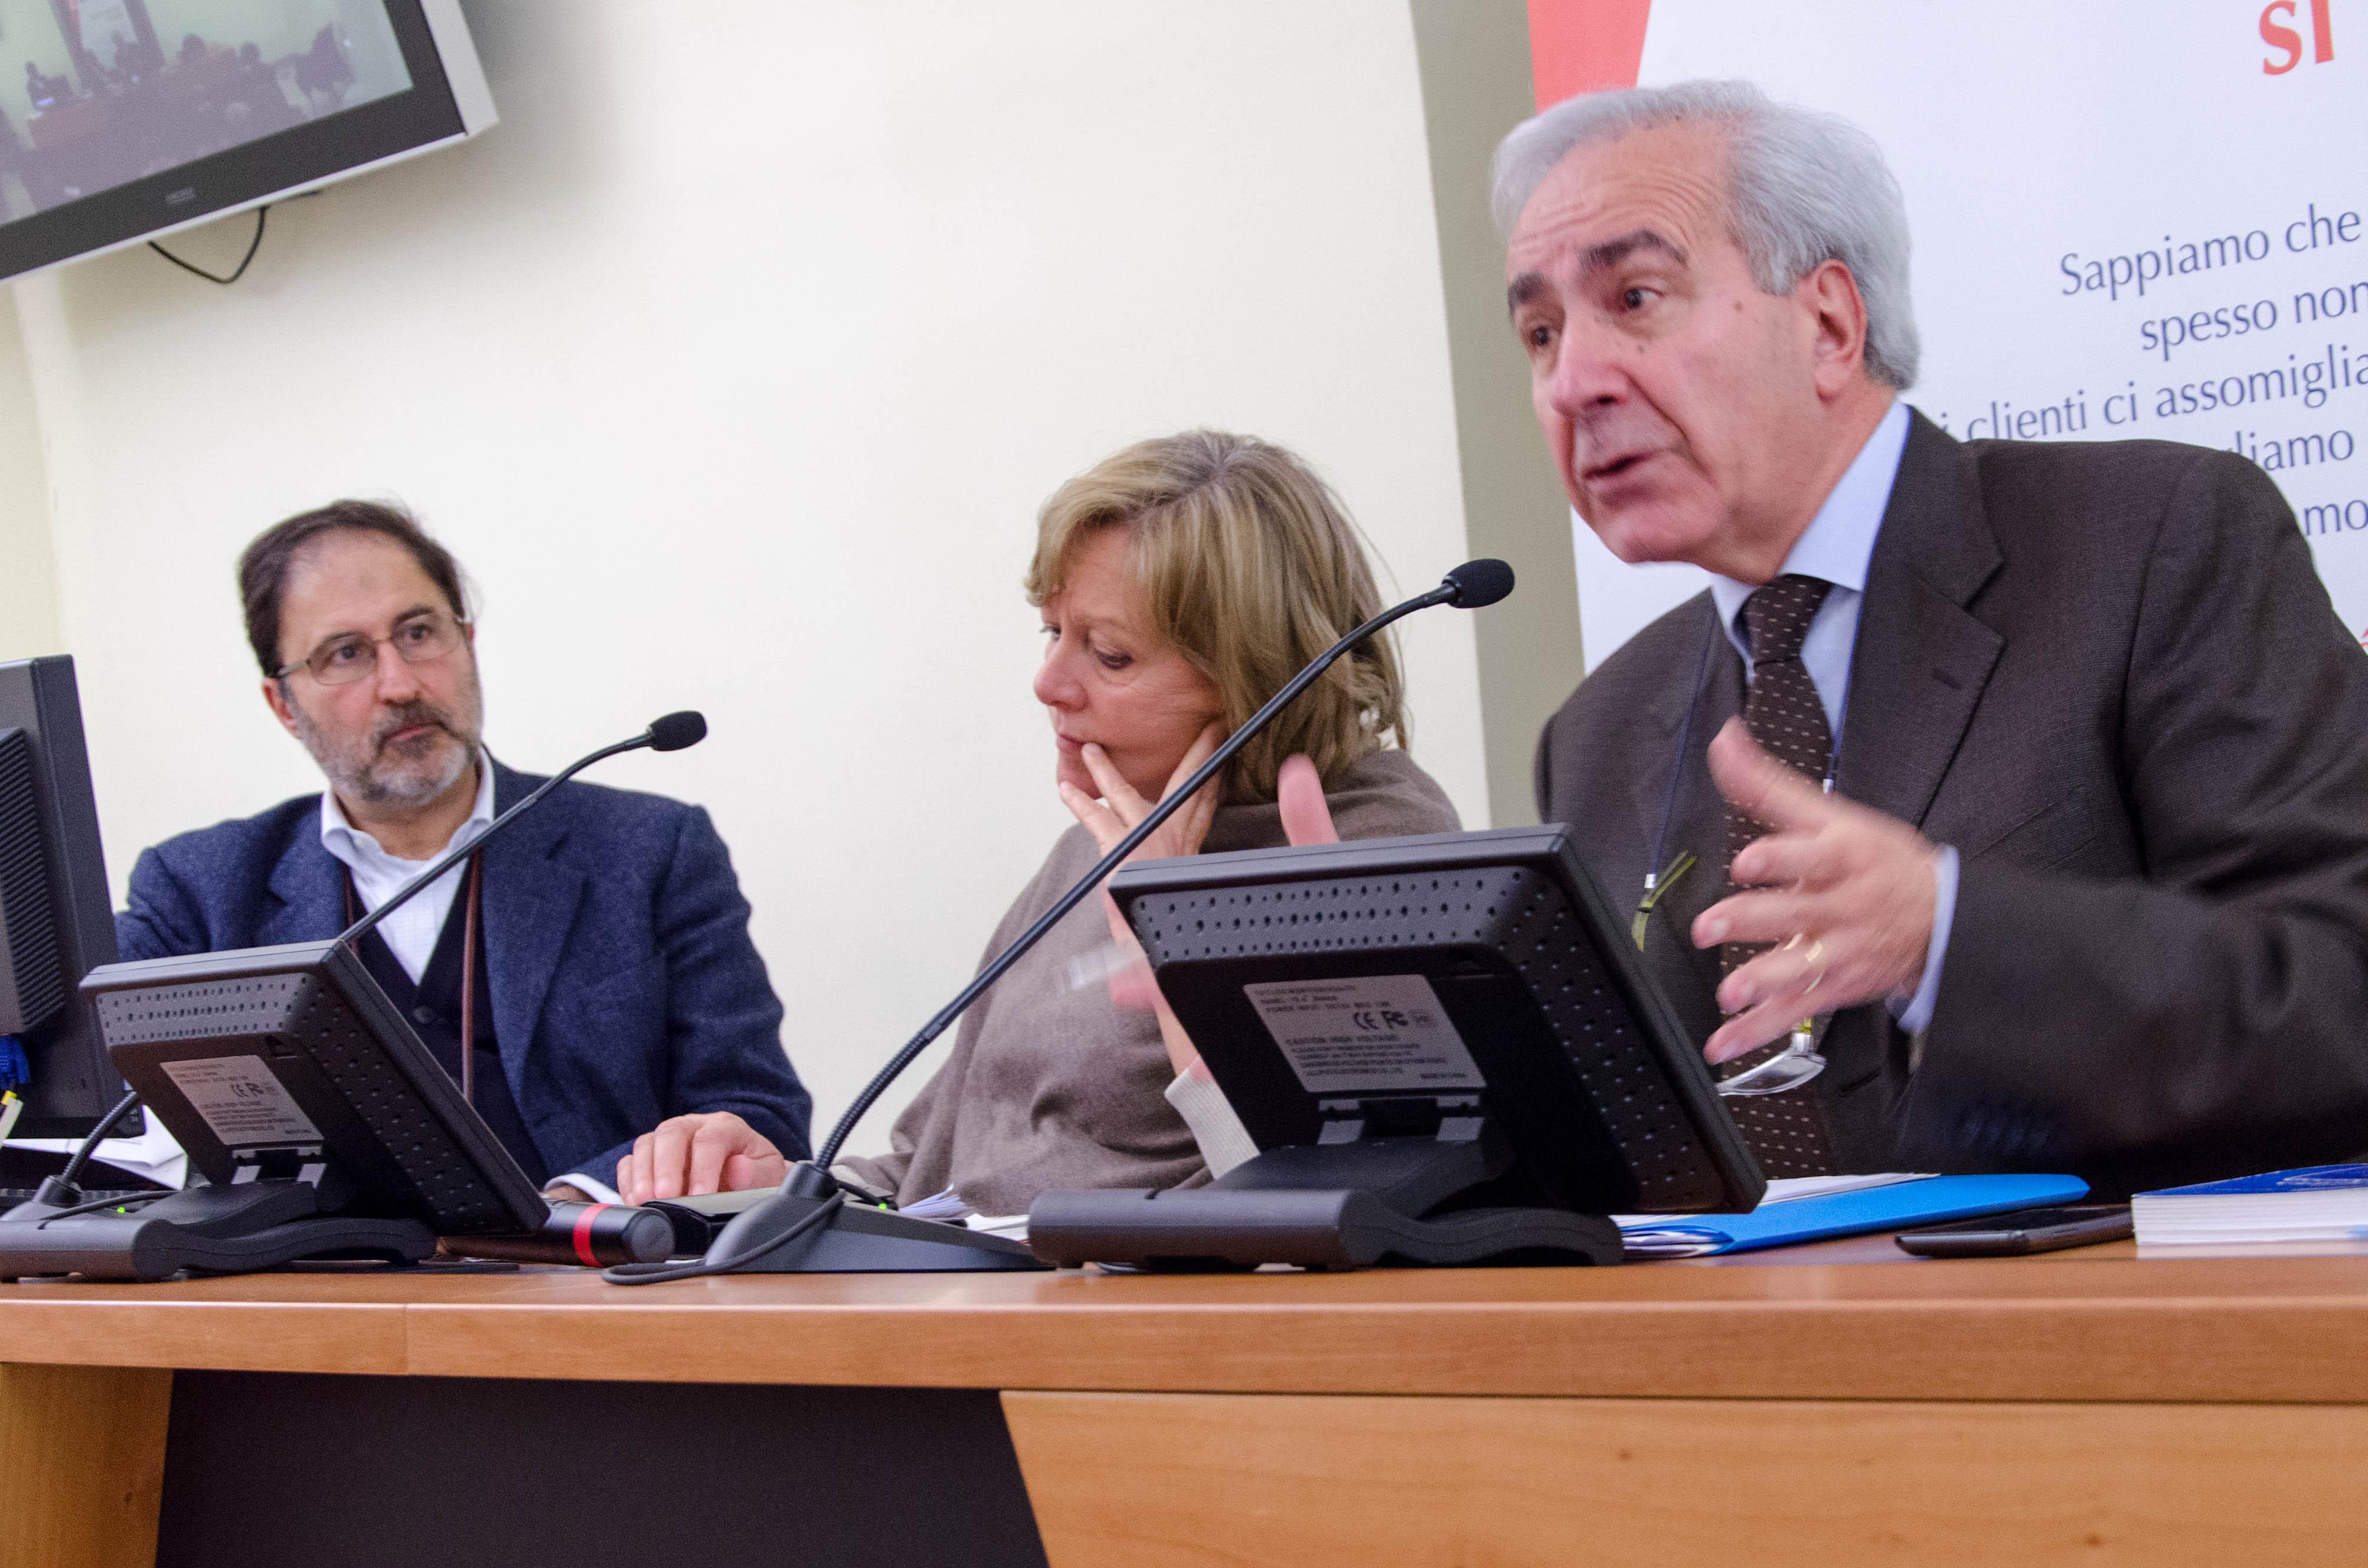 prof. Ennio Triggiani